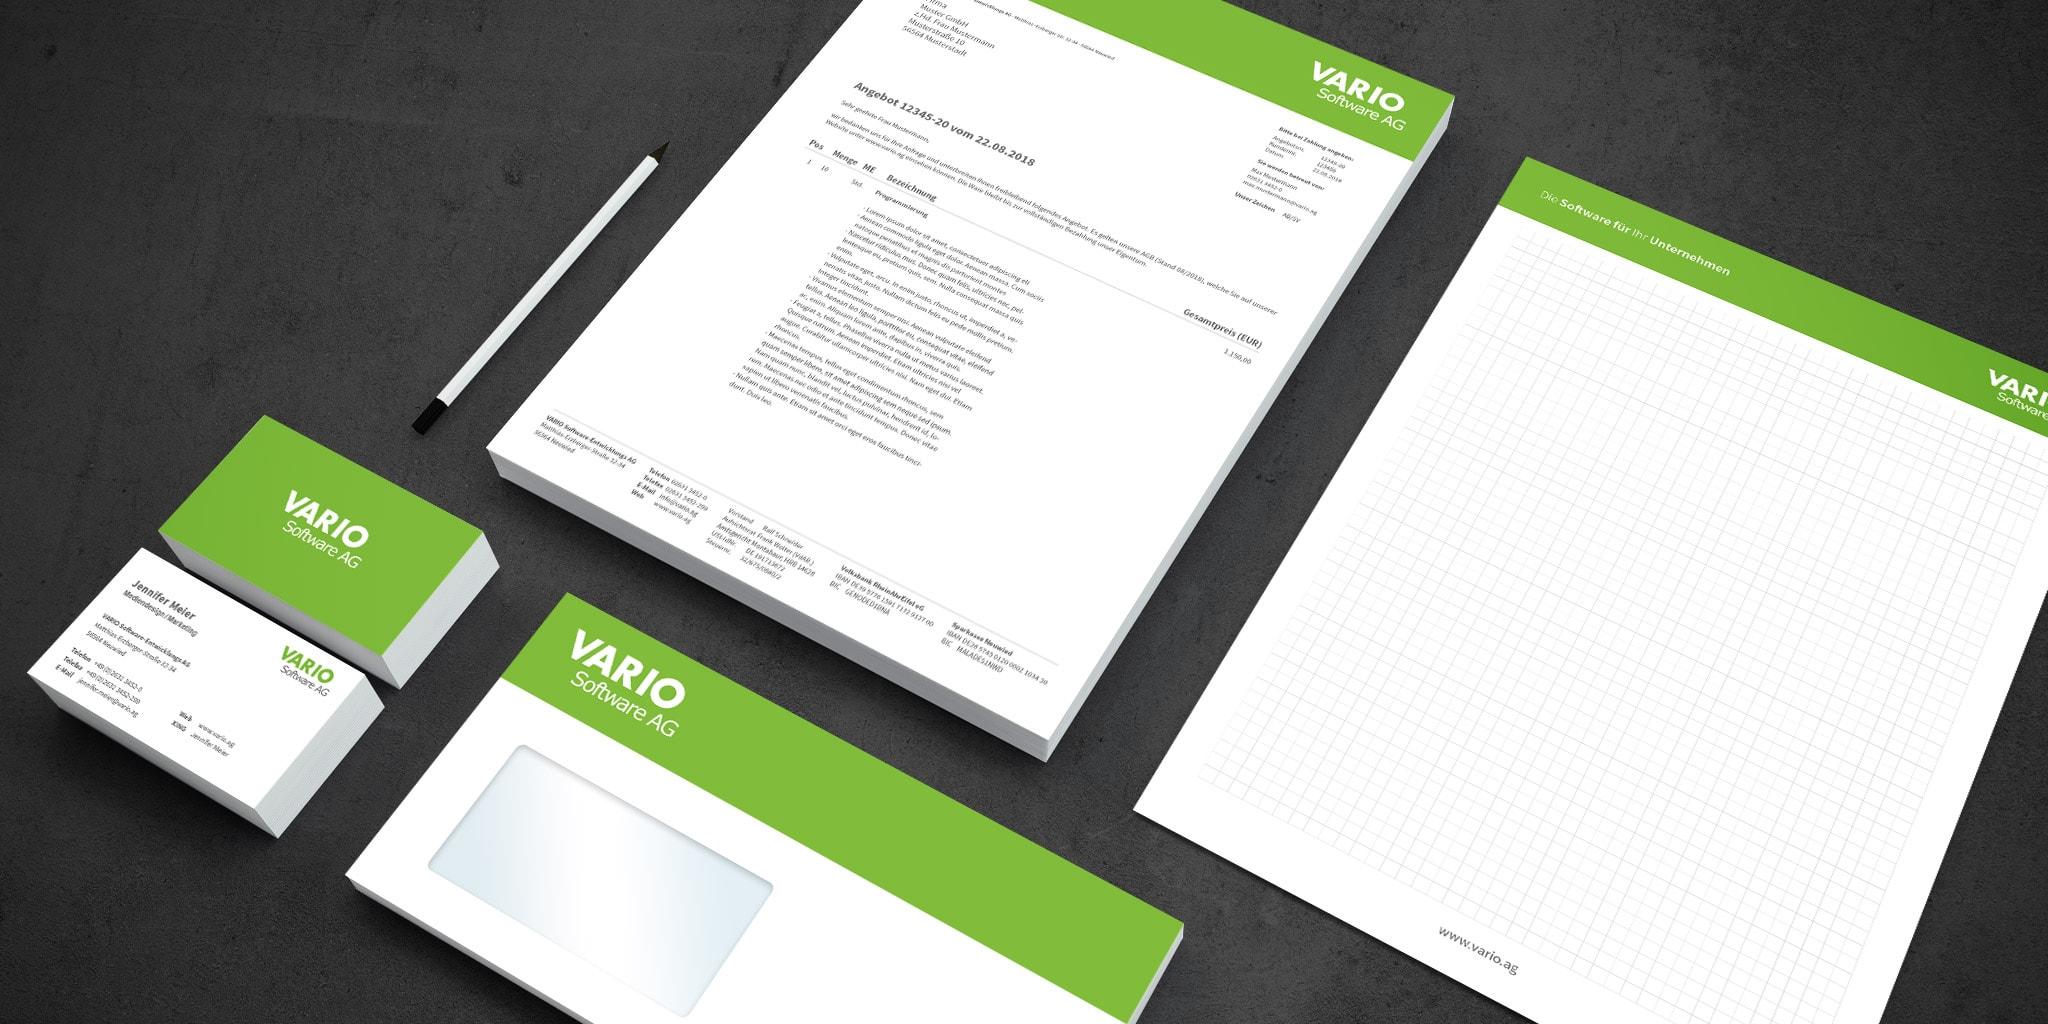 Logo und Corporate Design als VARIO Agenturleistung